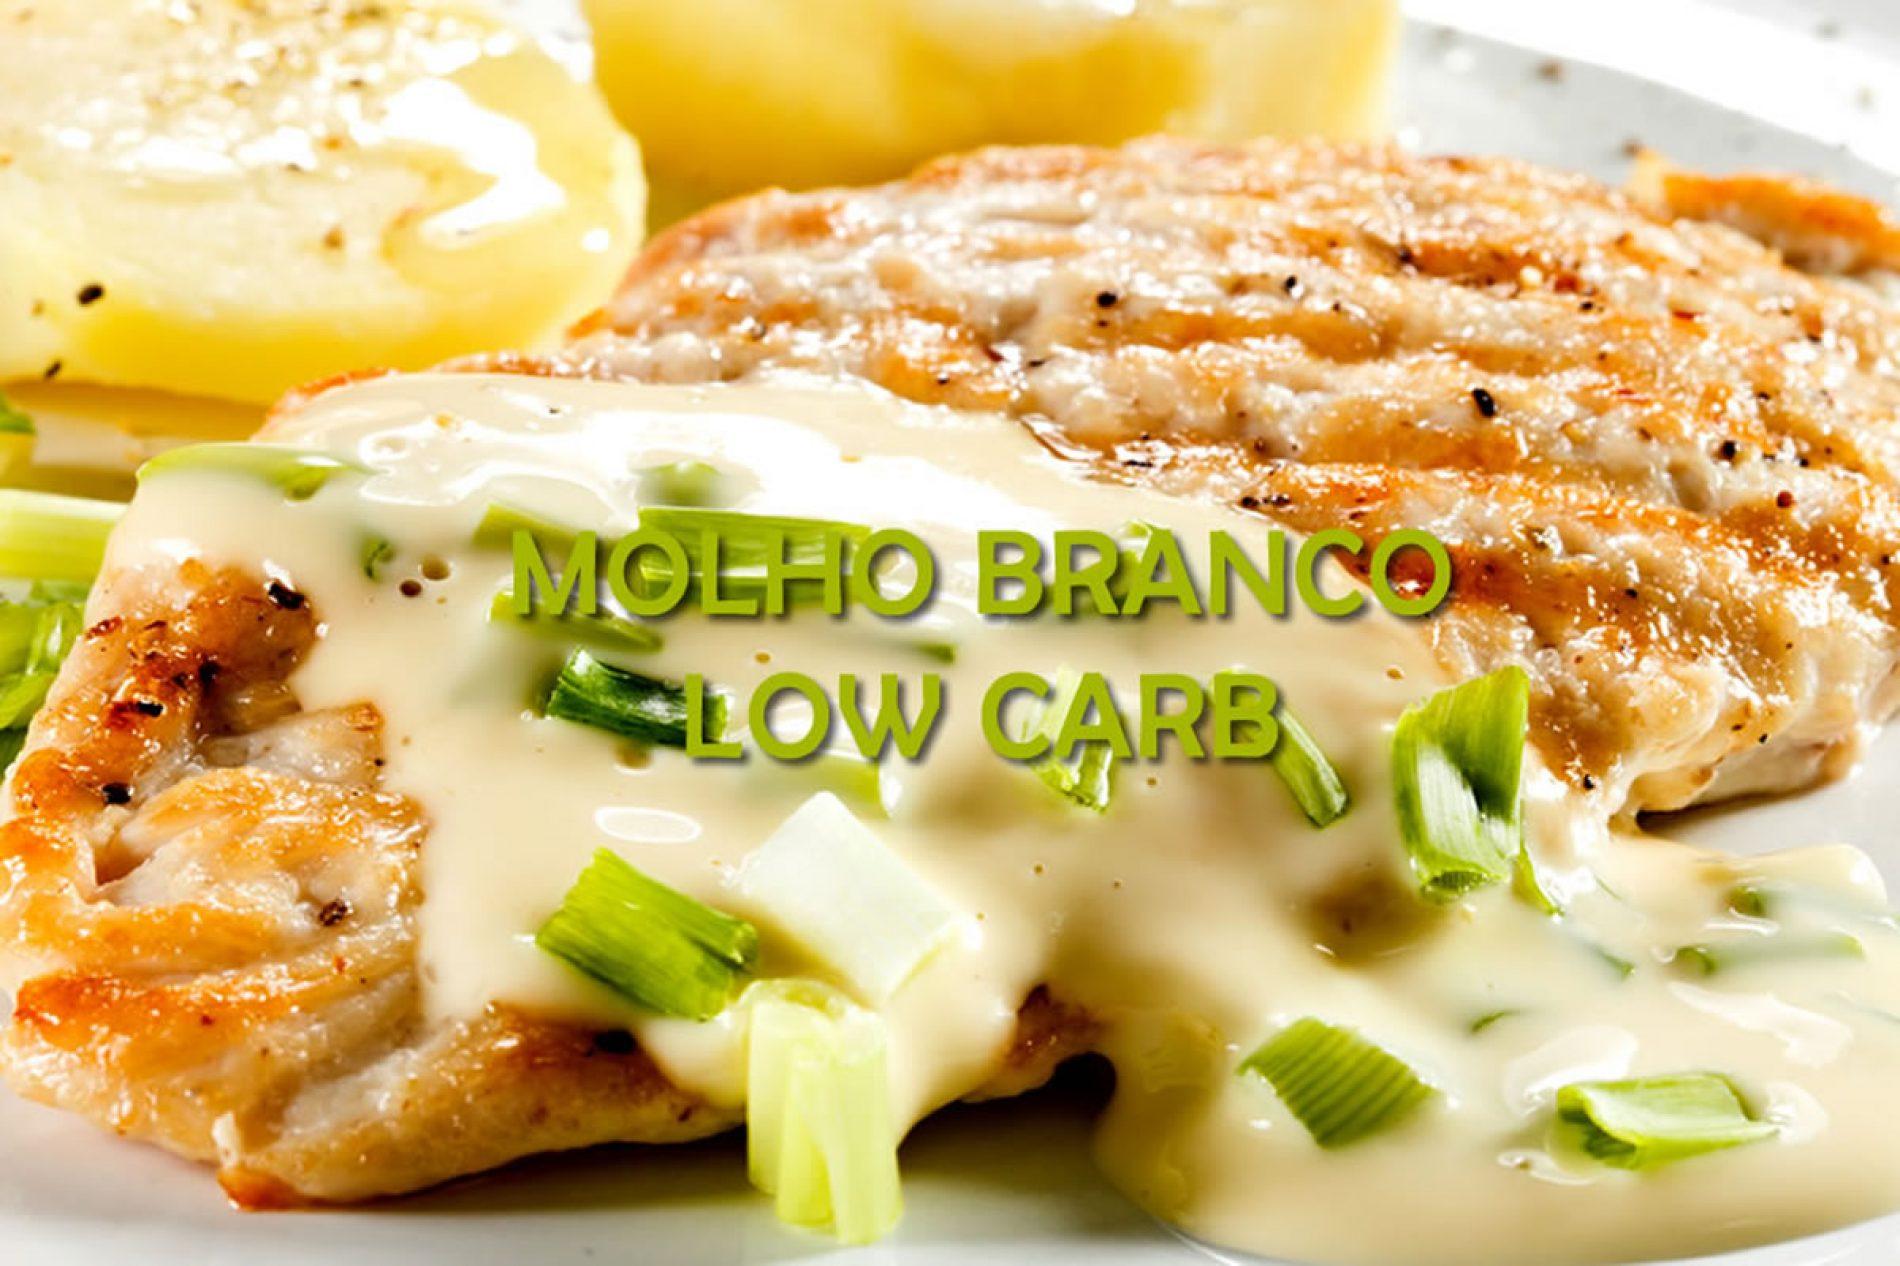 Molho branco Low Carb para carnes